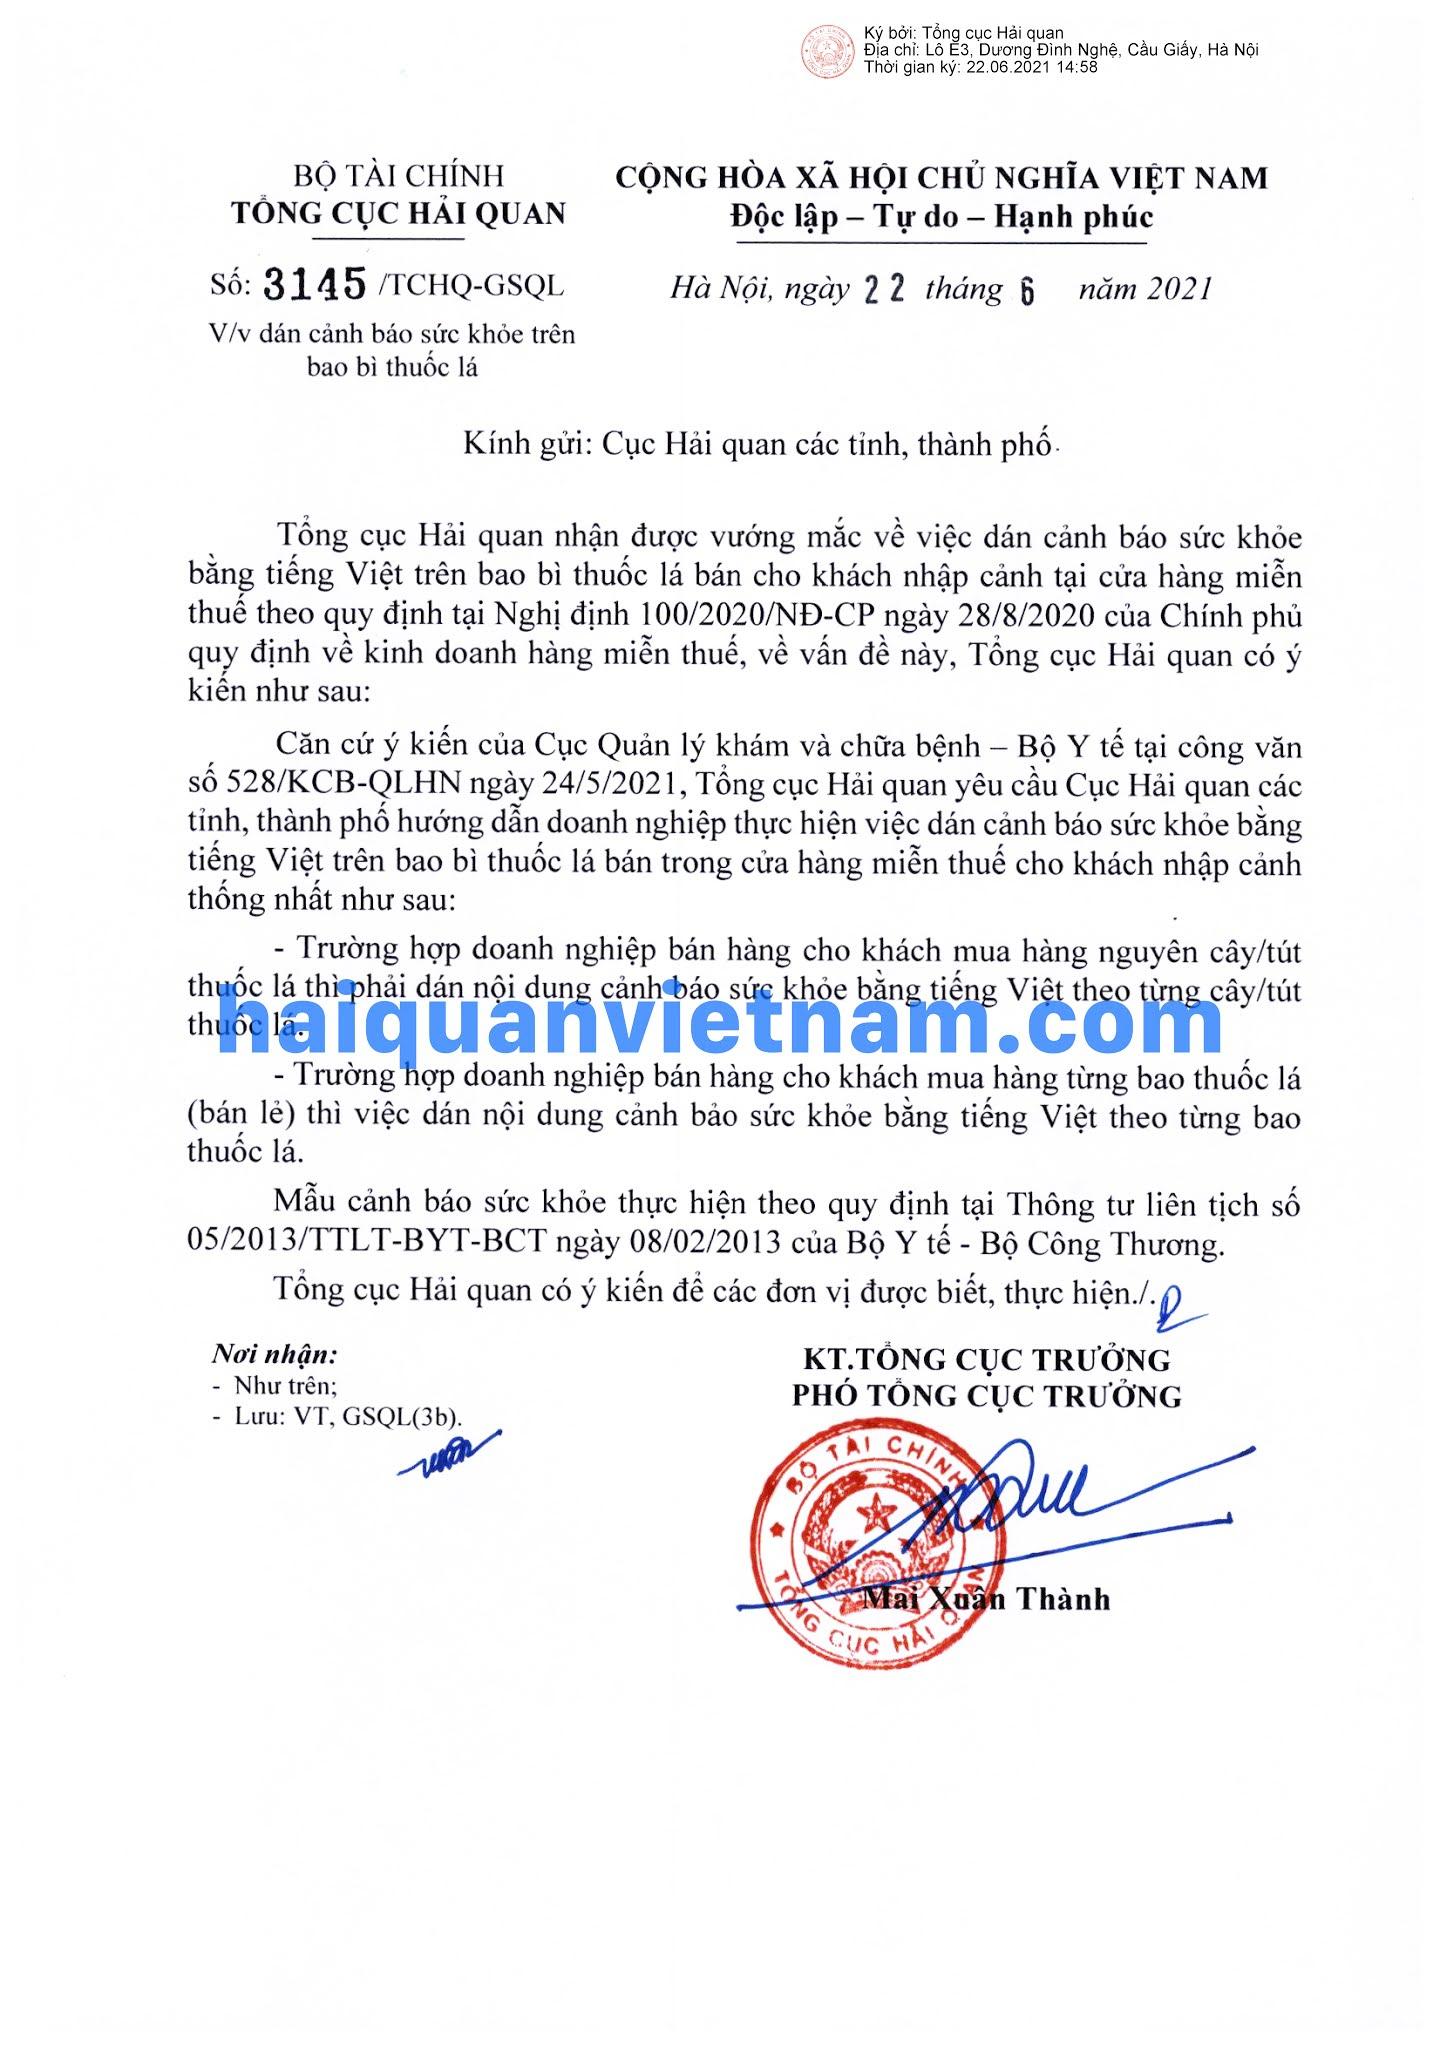 [Image: 210622_3145_TCHQ-GSQL_haiquanvietnam_01.jpg]